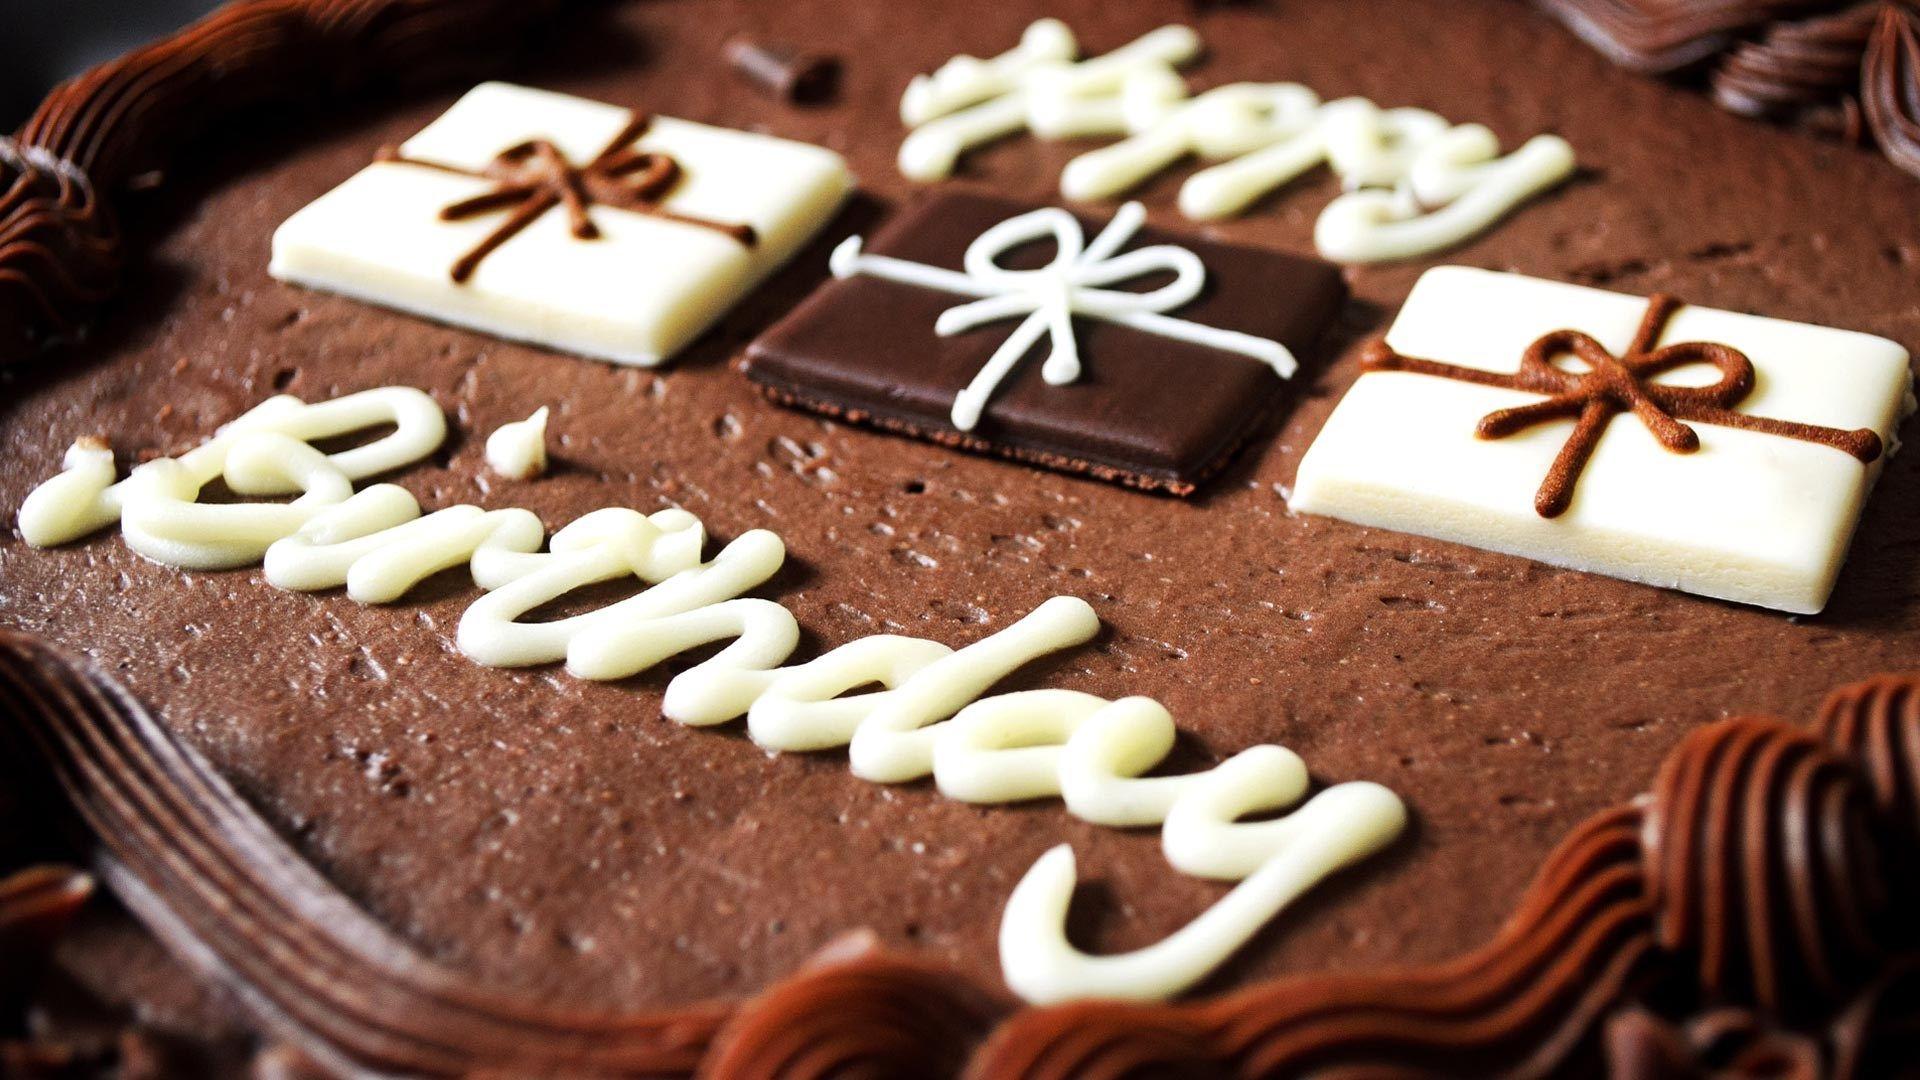 happy birthday chocolate cake wallpaper hd desktop | ololoshenka